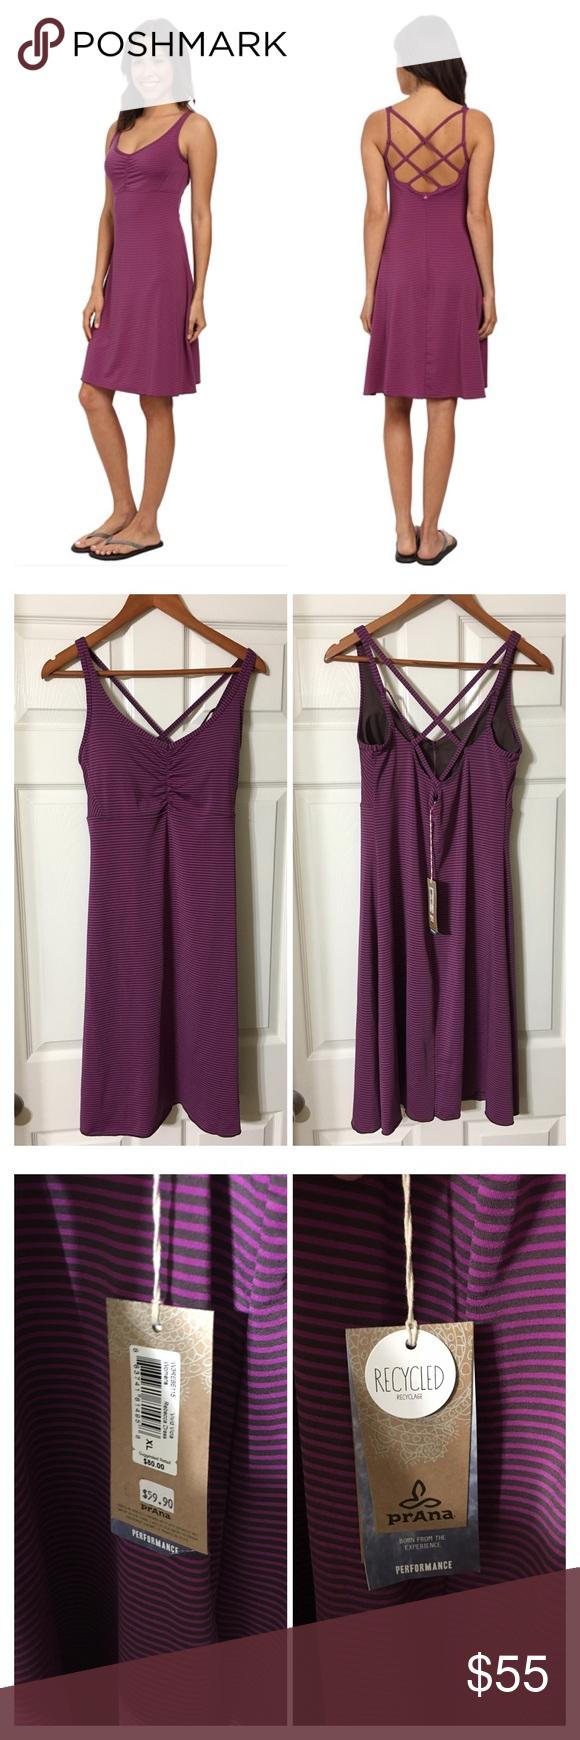 Pink n purple dress  PrAna Rebecca dress NWT  Flaws Brown and Customer support